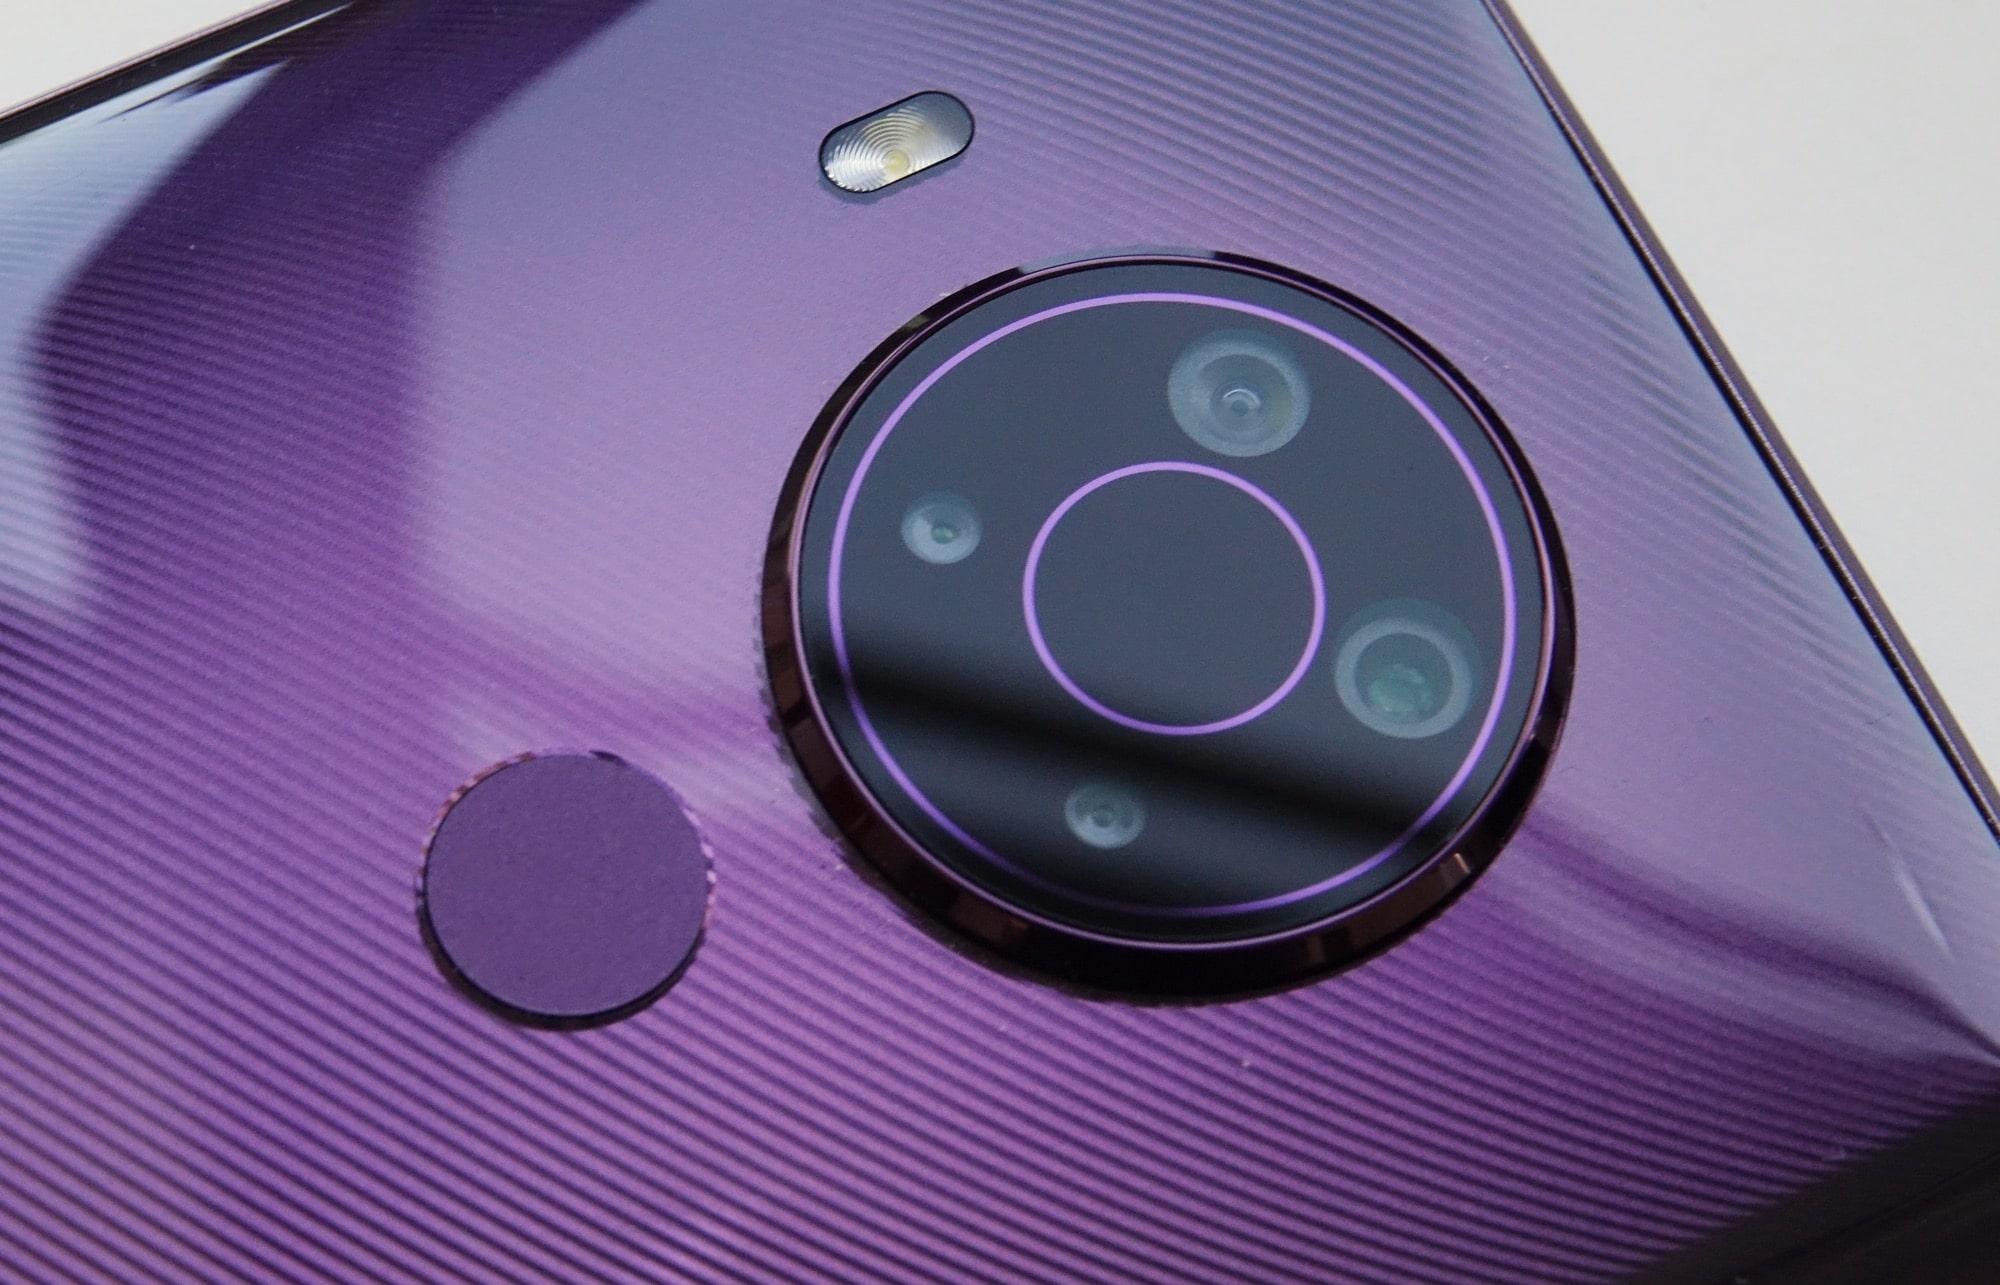 The fingerprint sensor and the cameras on the Nokia 5.4